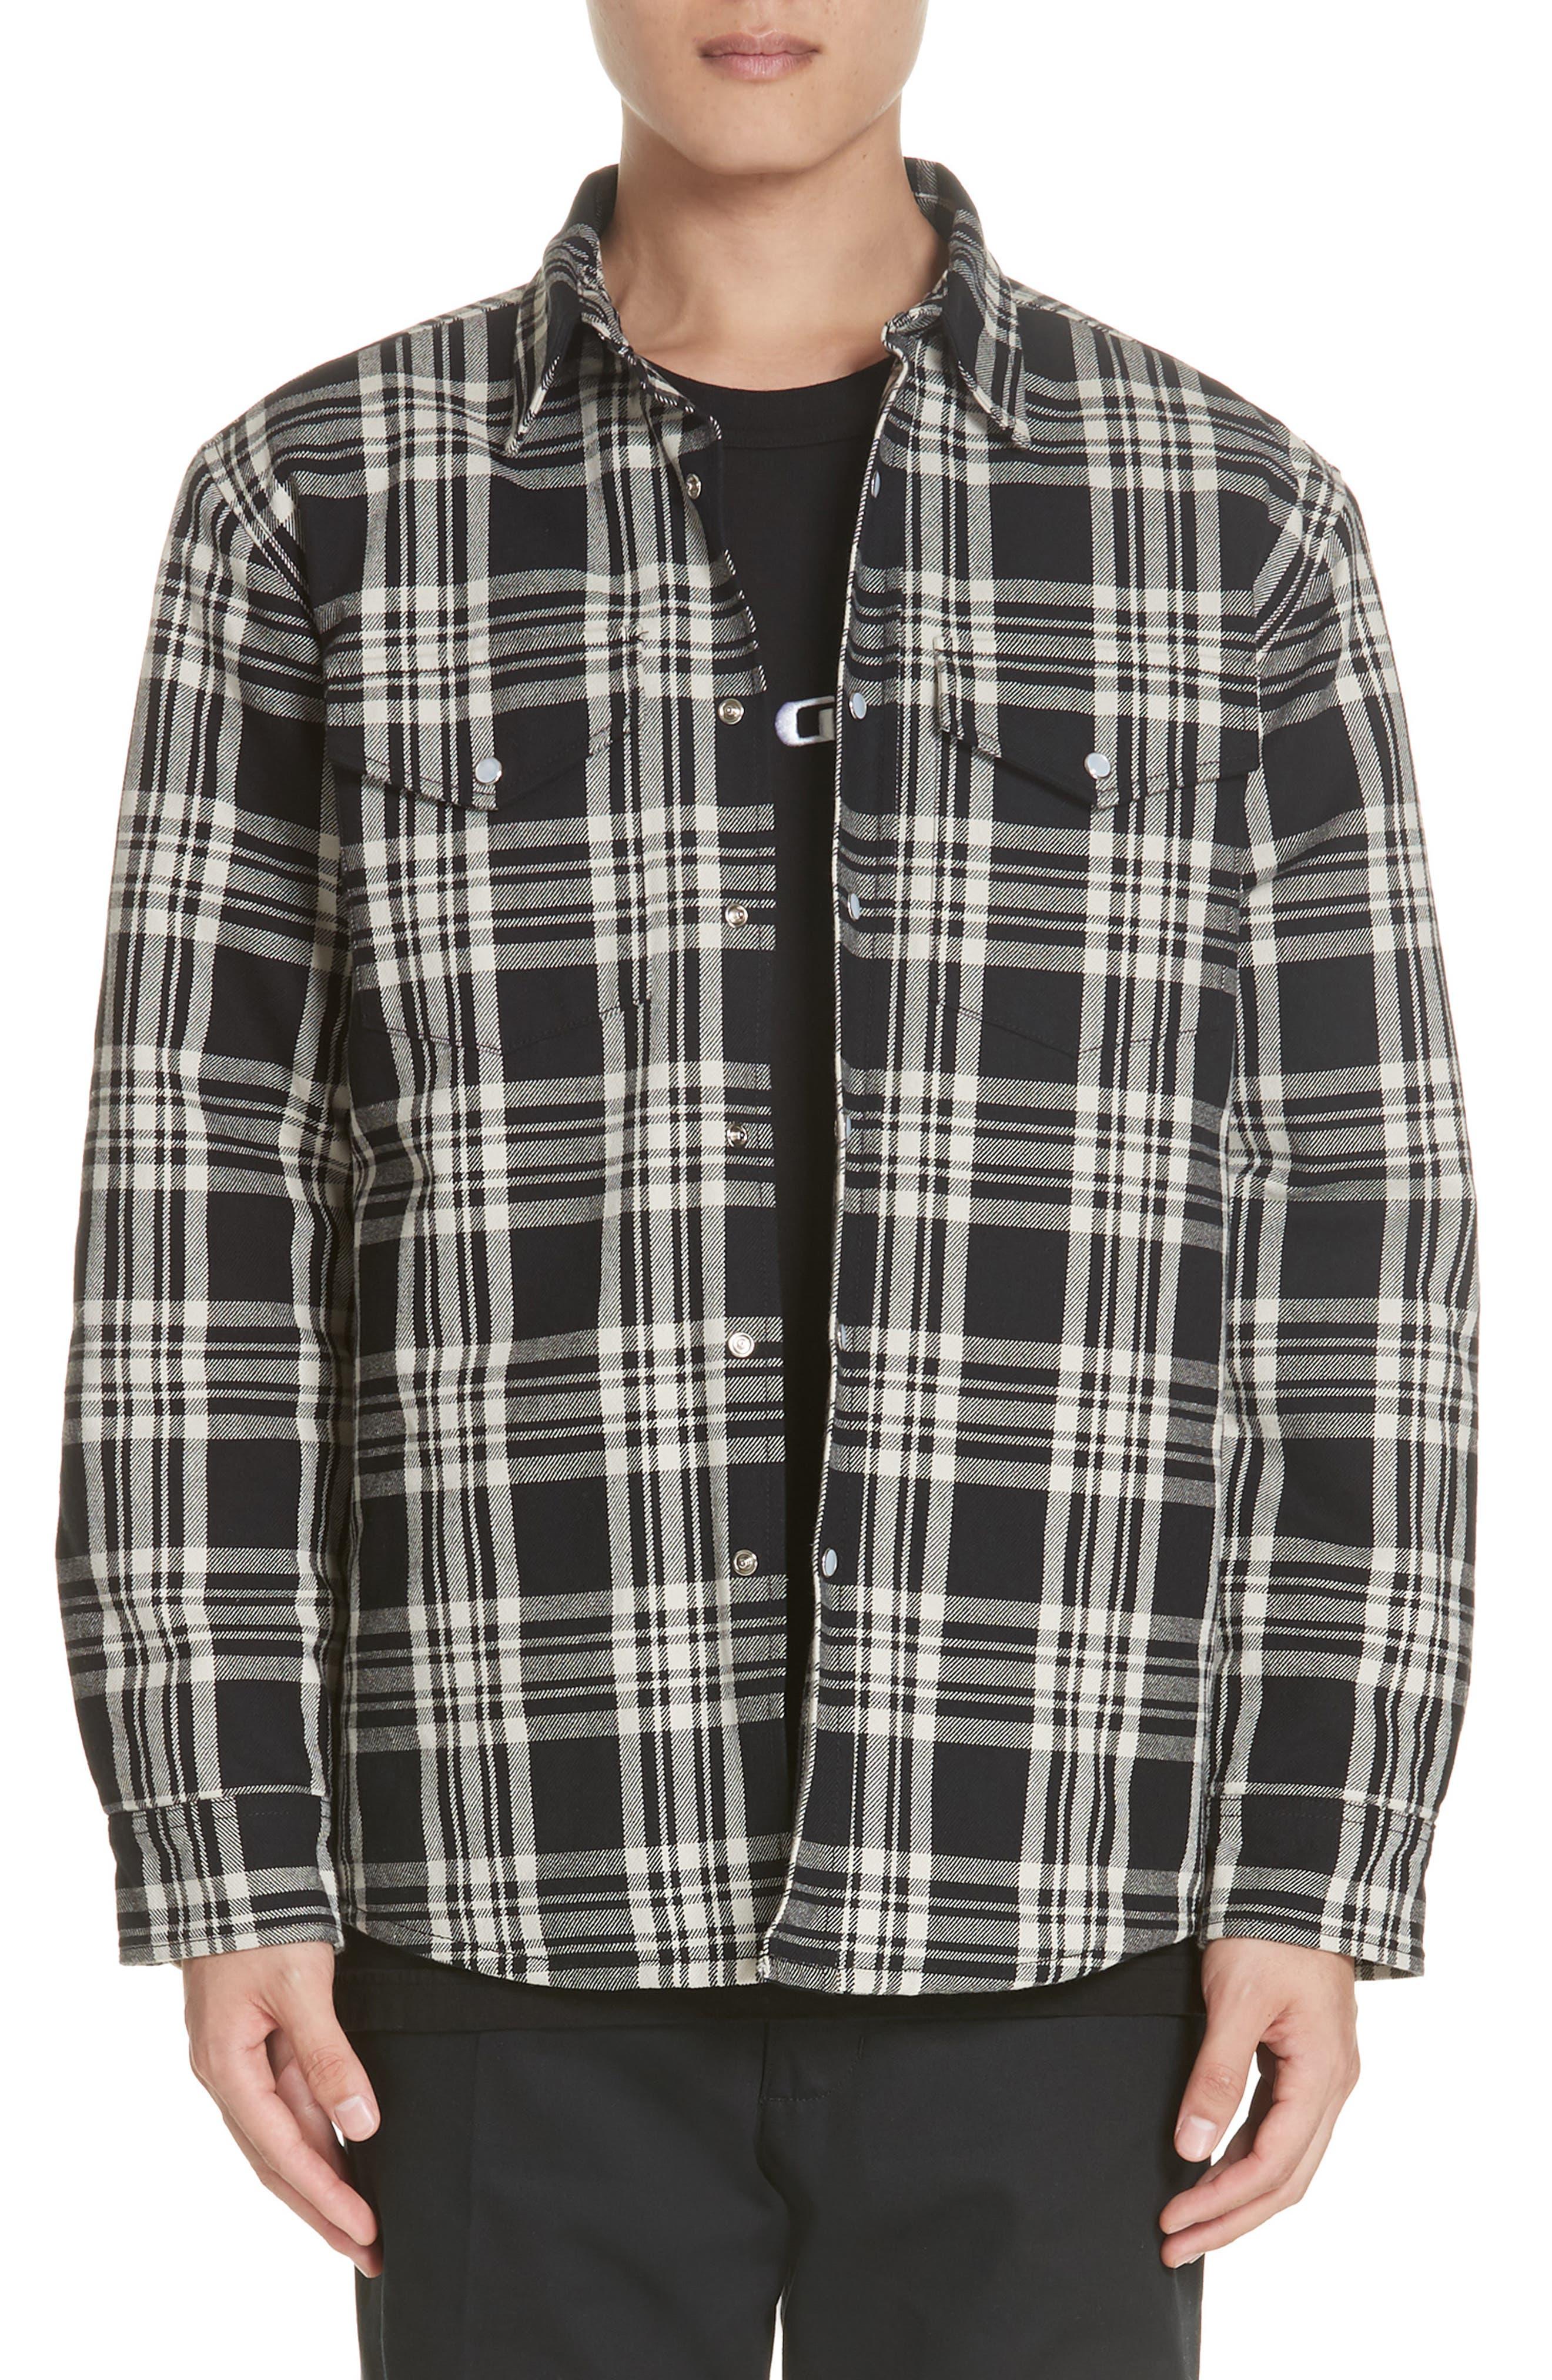 Noon Goons Lbc Plaid Flannel Shirt Jacket, Black